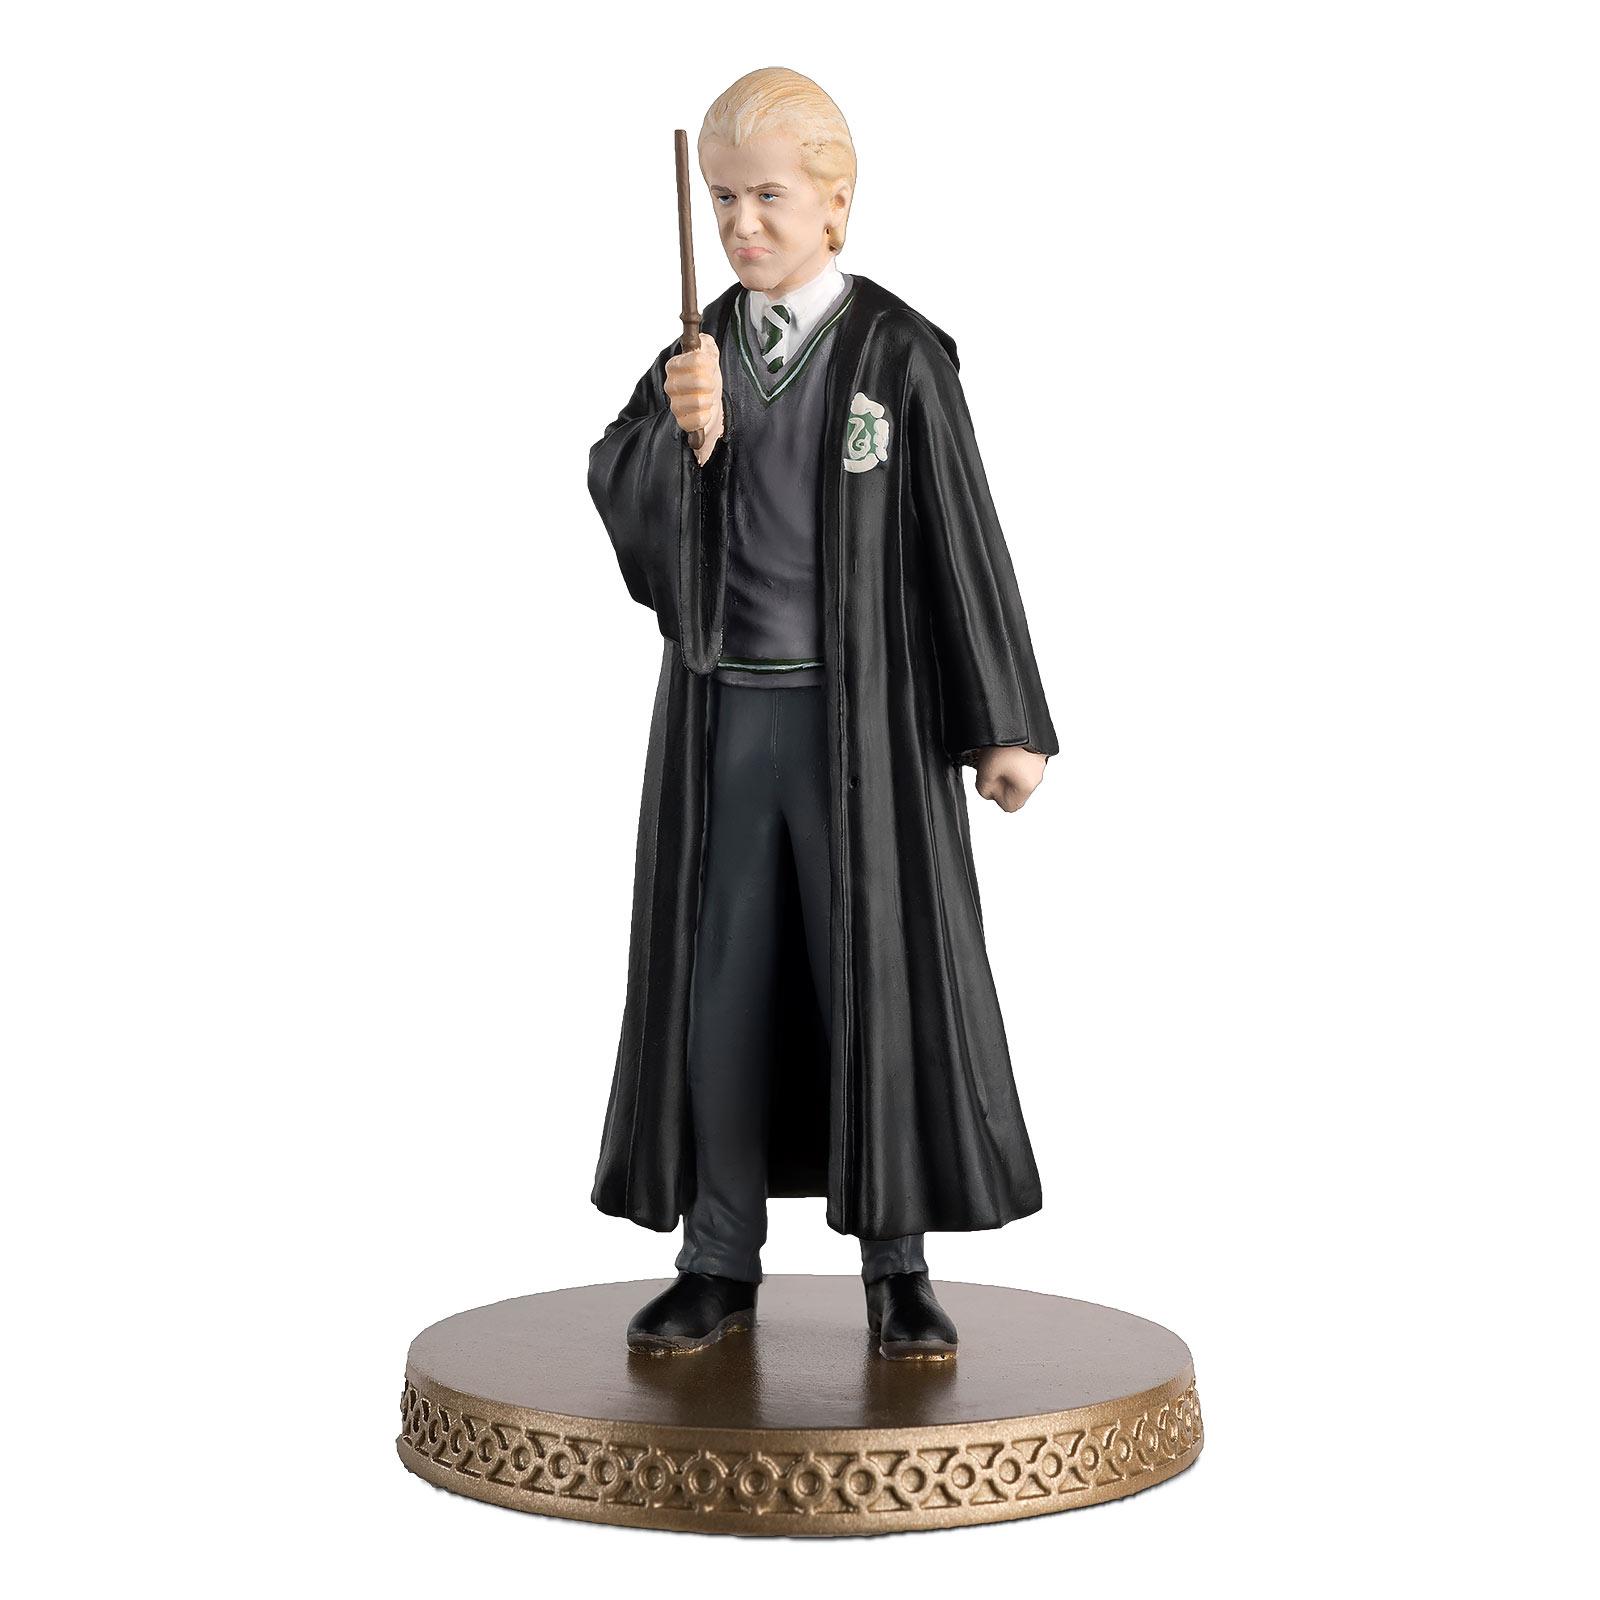 Draco Malfoy Hero Collector Figur 10 cm - Harry Potter